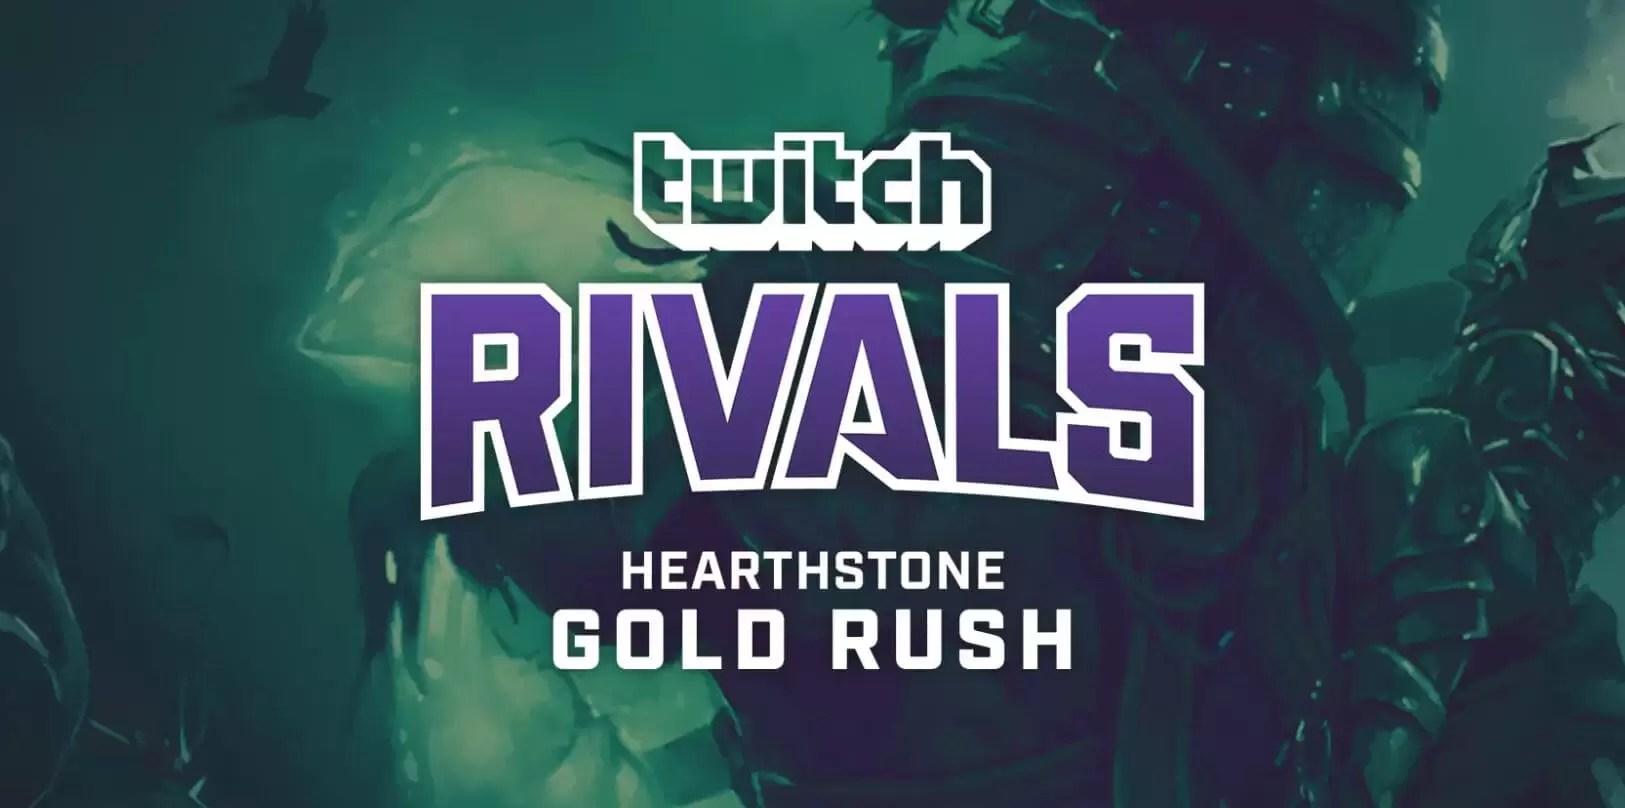 Twitch Rivals: Hearthstone zlatna groznica u borbi za 25 000 dolara!